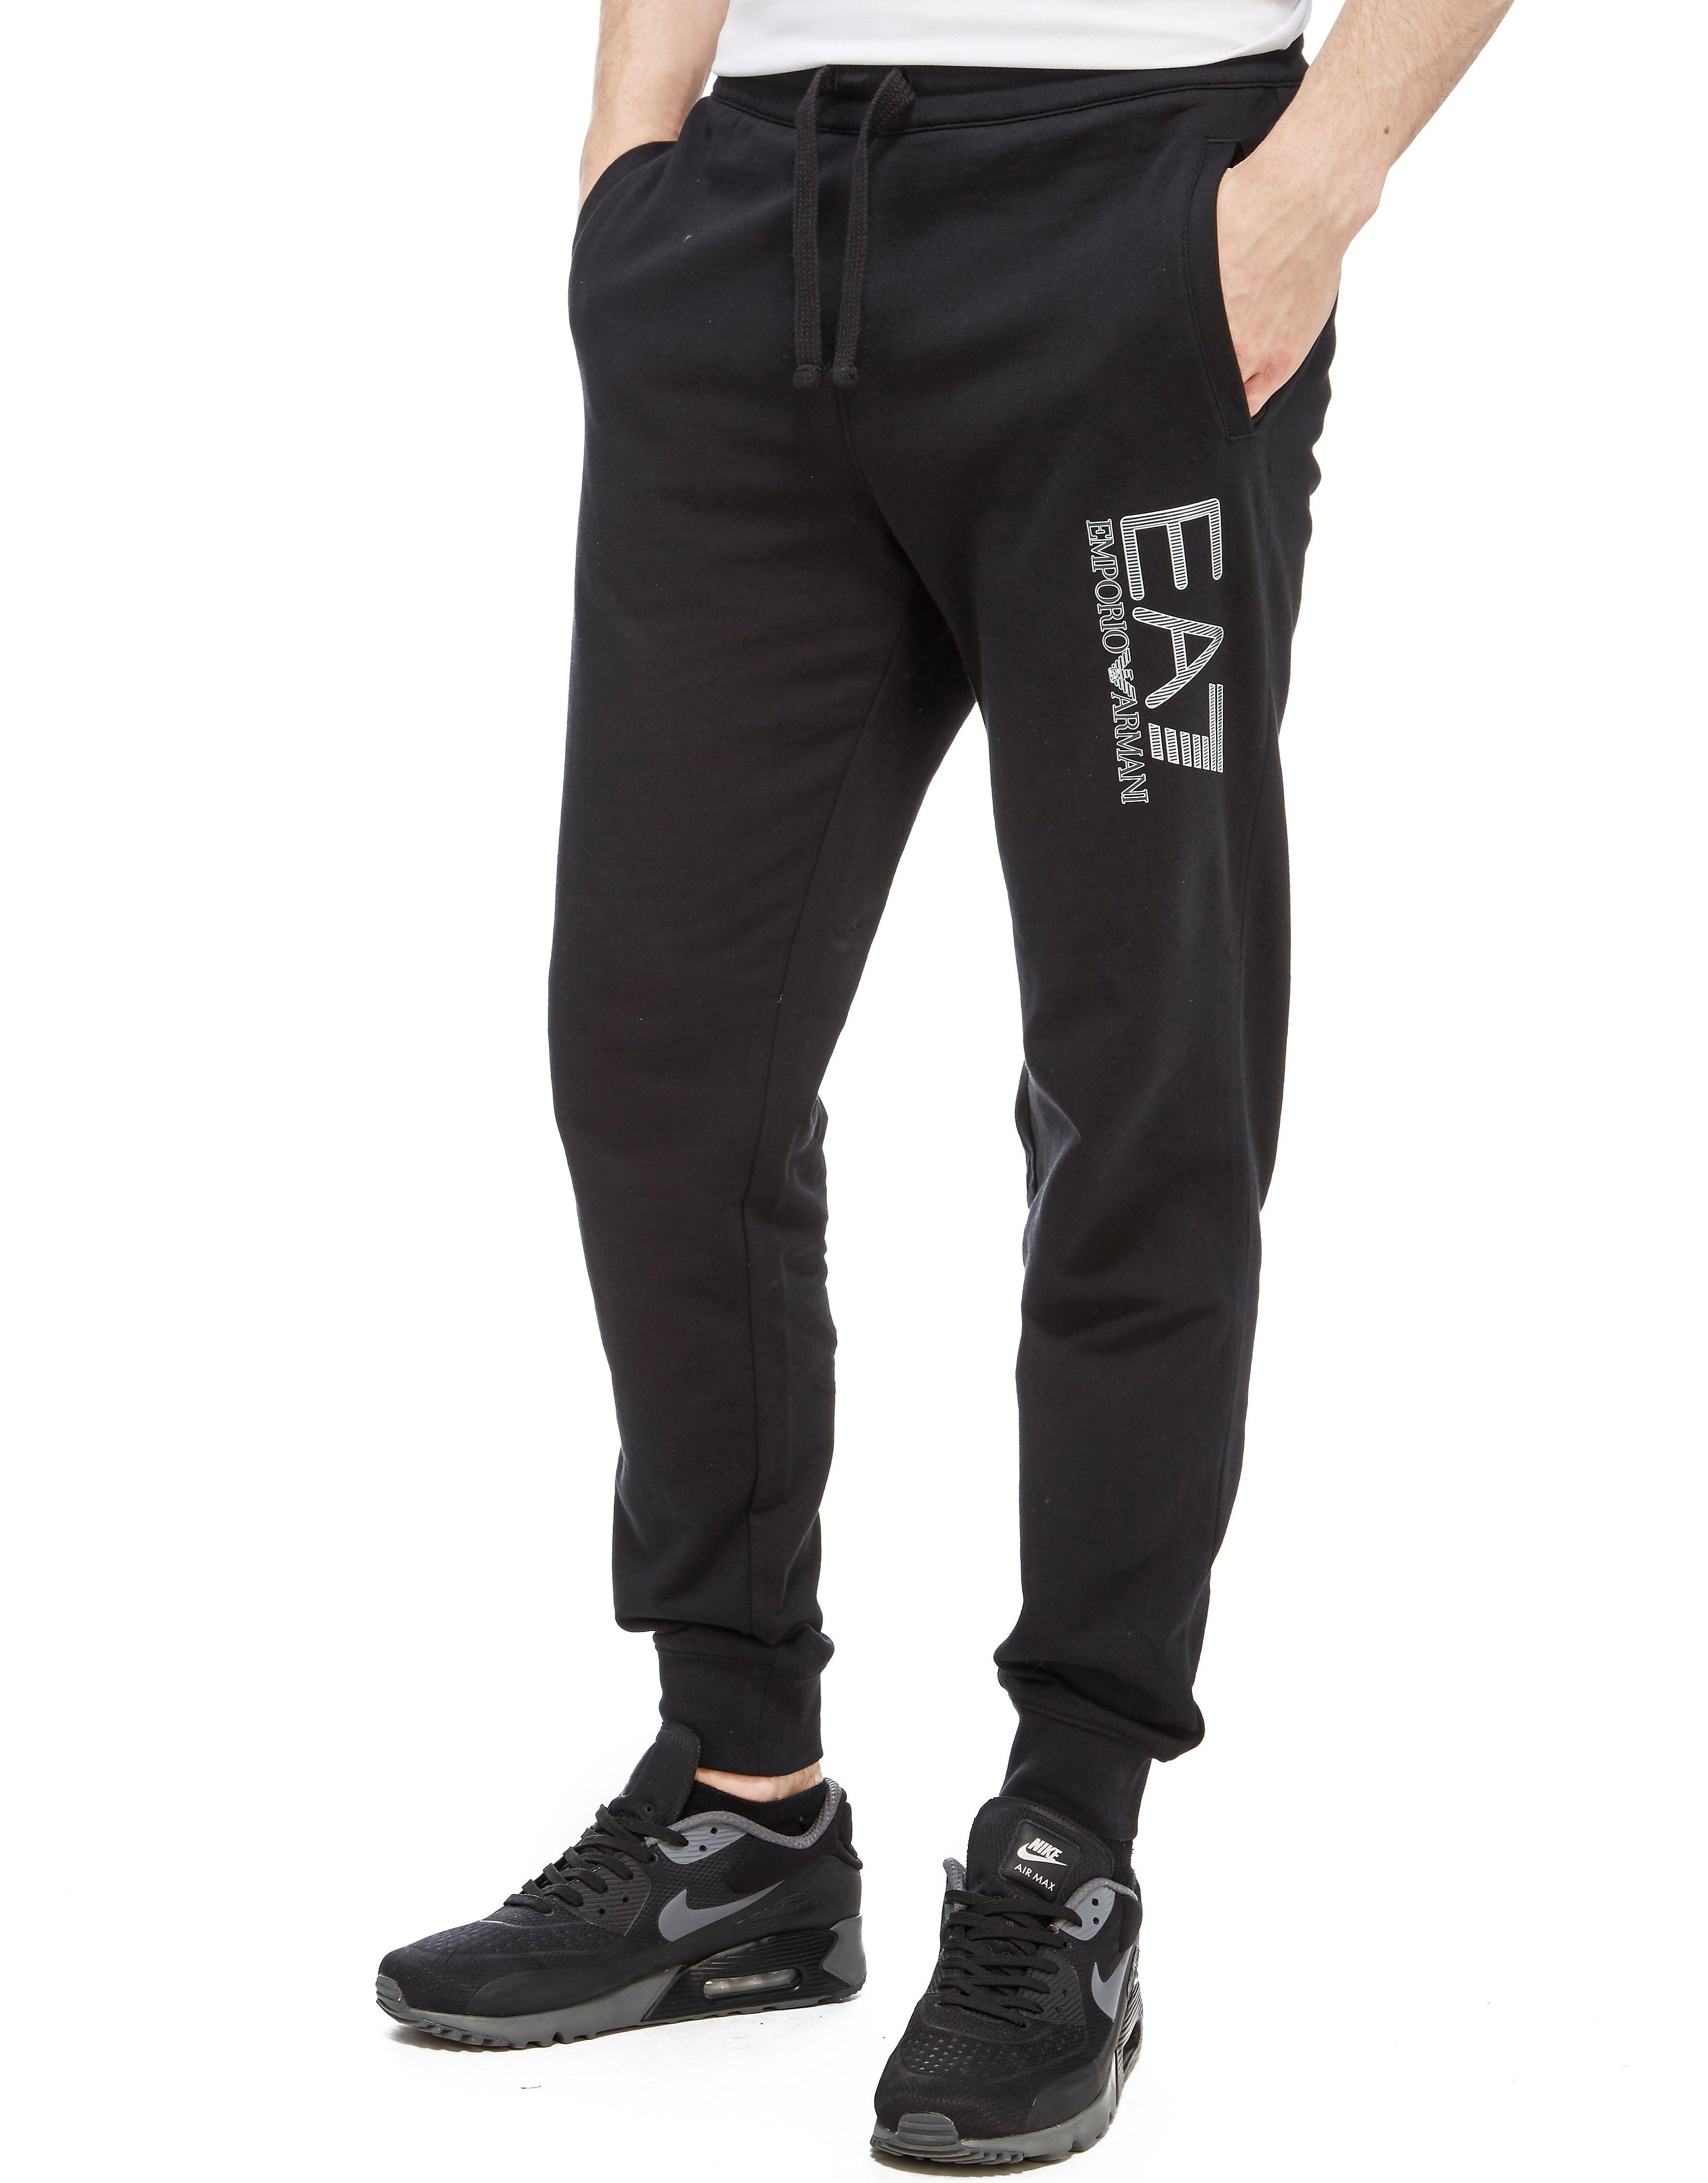 Emporio Armani EA7 VIS Cuffed Track Pants